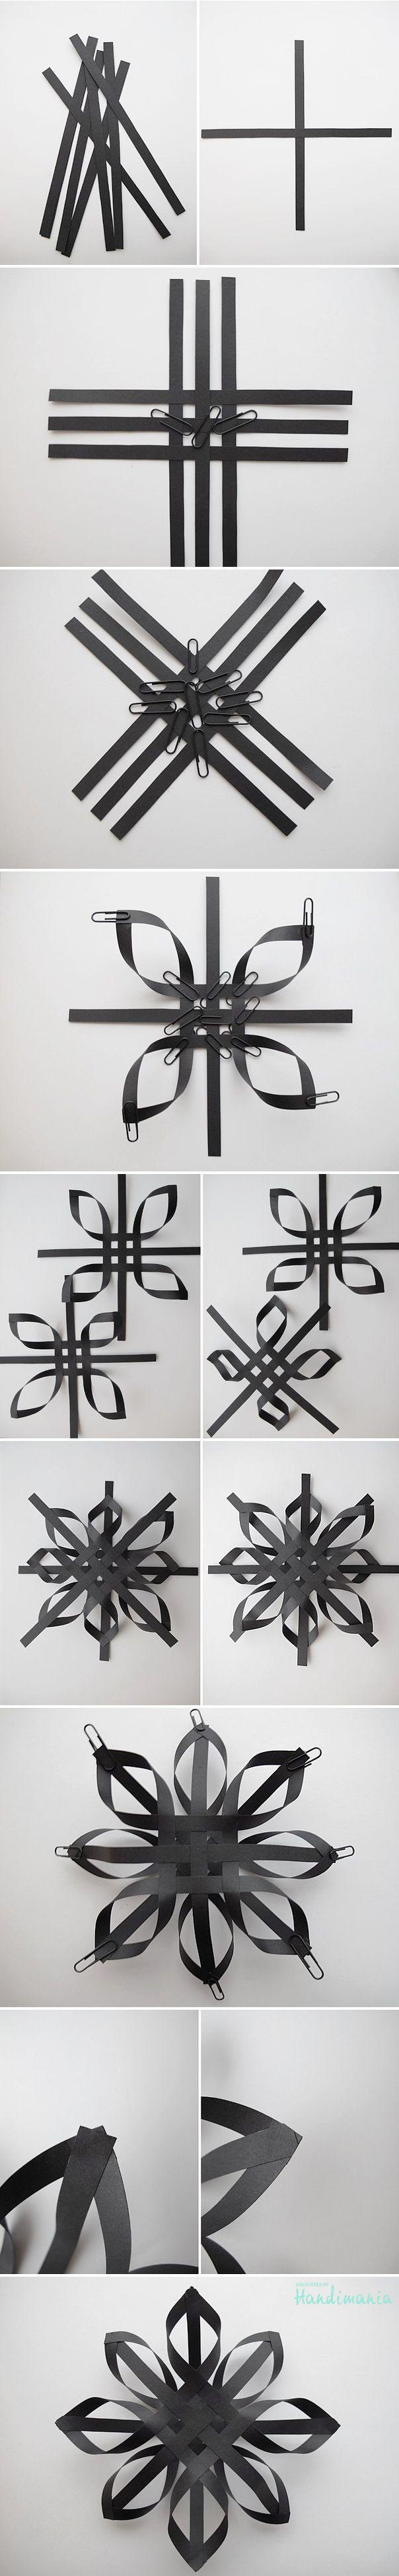 Black Paper Snowflake